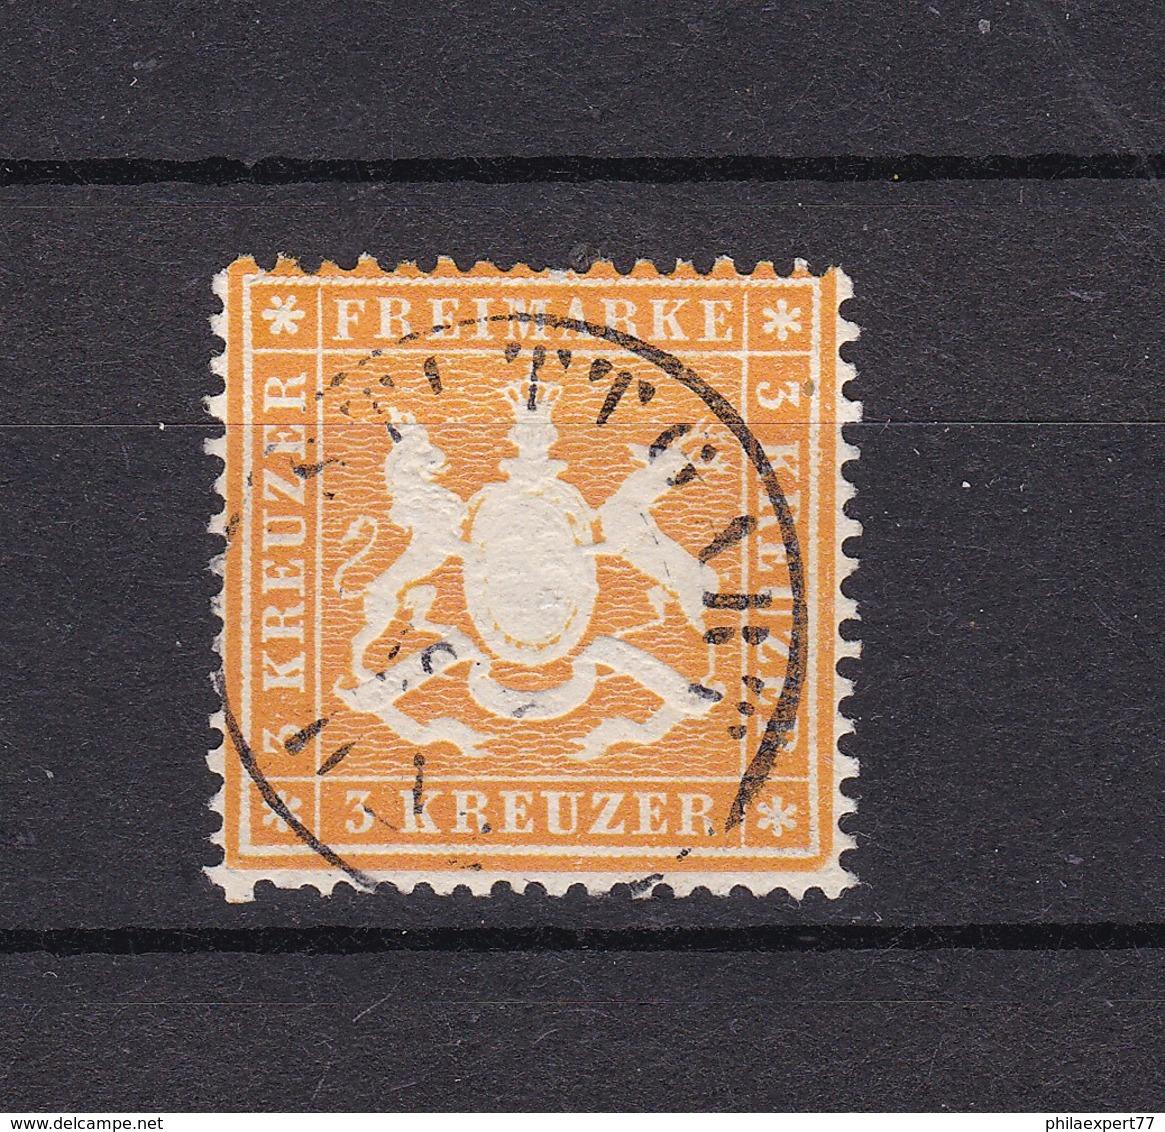 Wuerttemberg - 1860 - Michel Nr. 17 X C - BPP Gepr. - Wuerttemberg